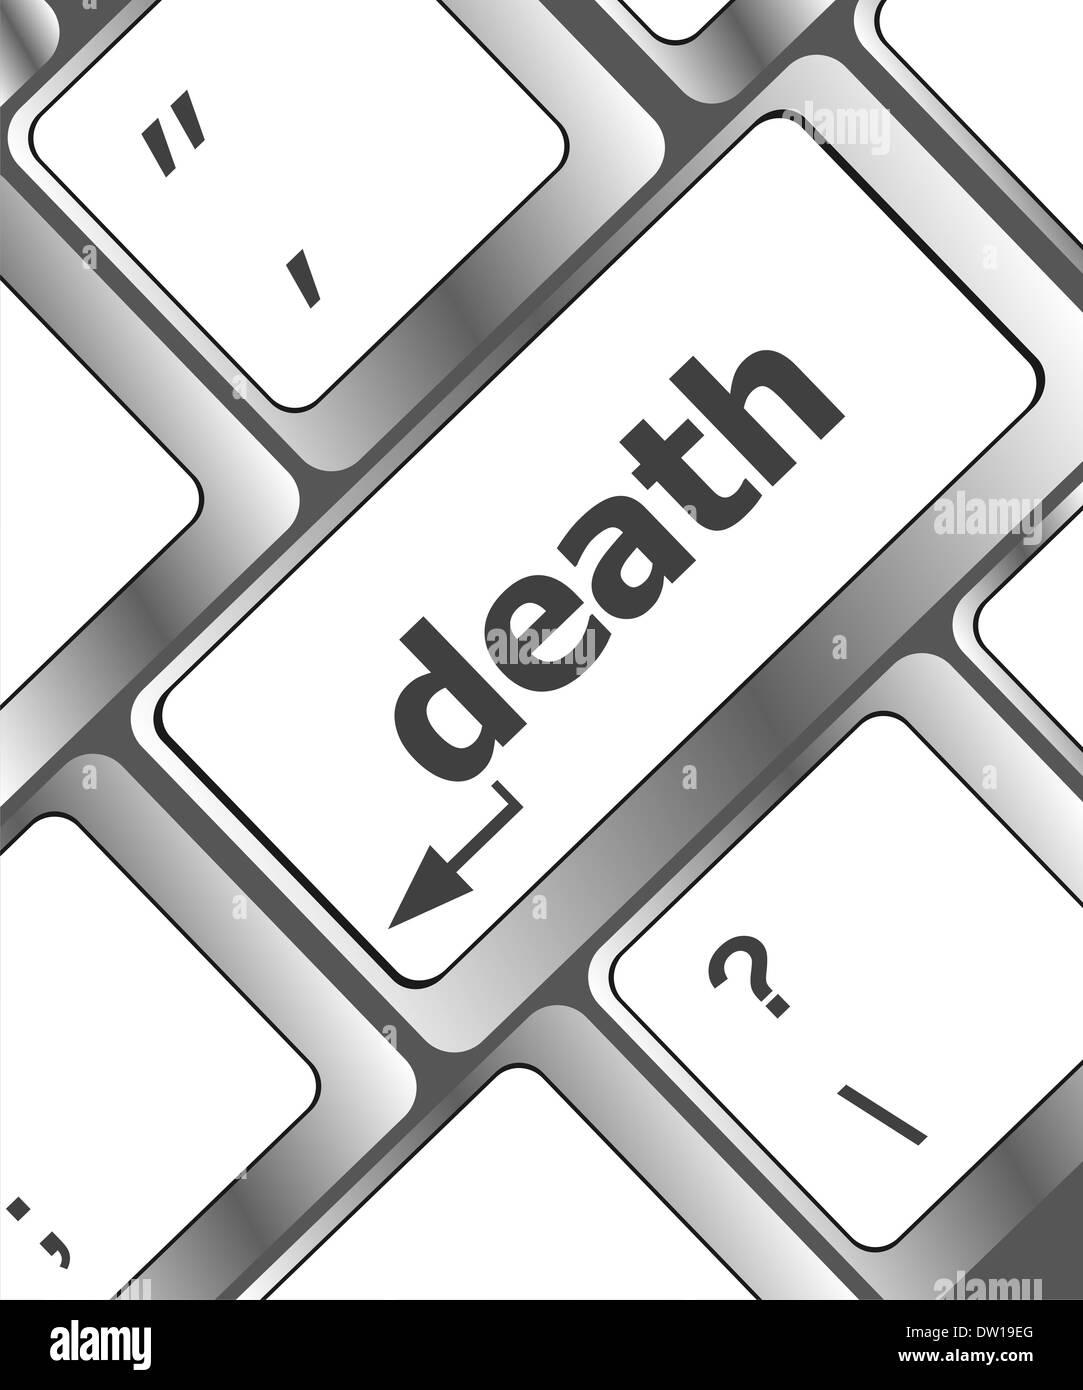 keyboard with death word